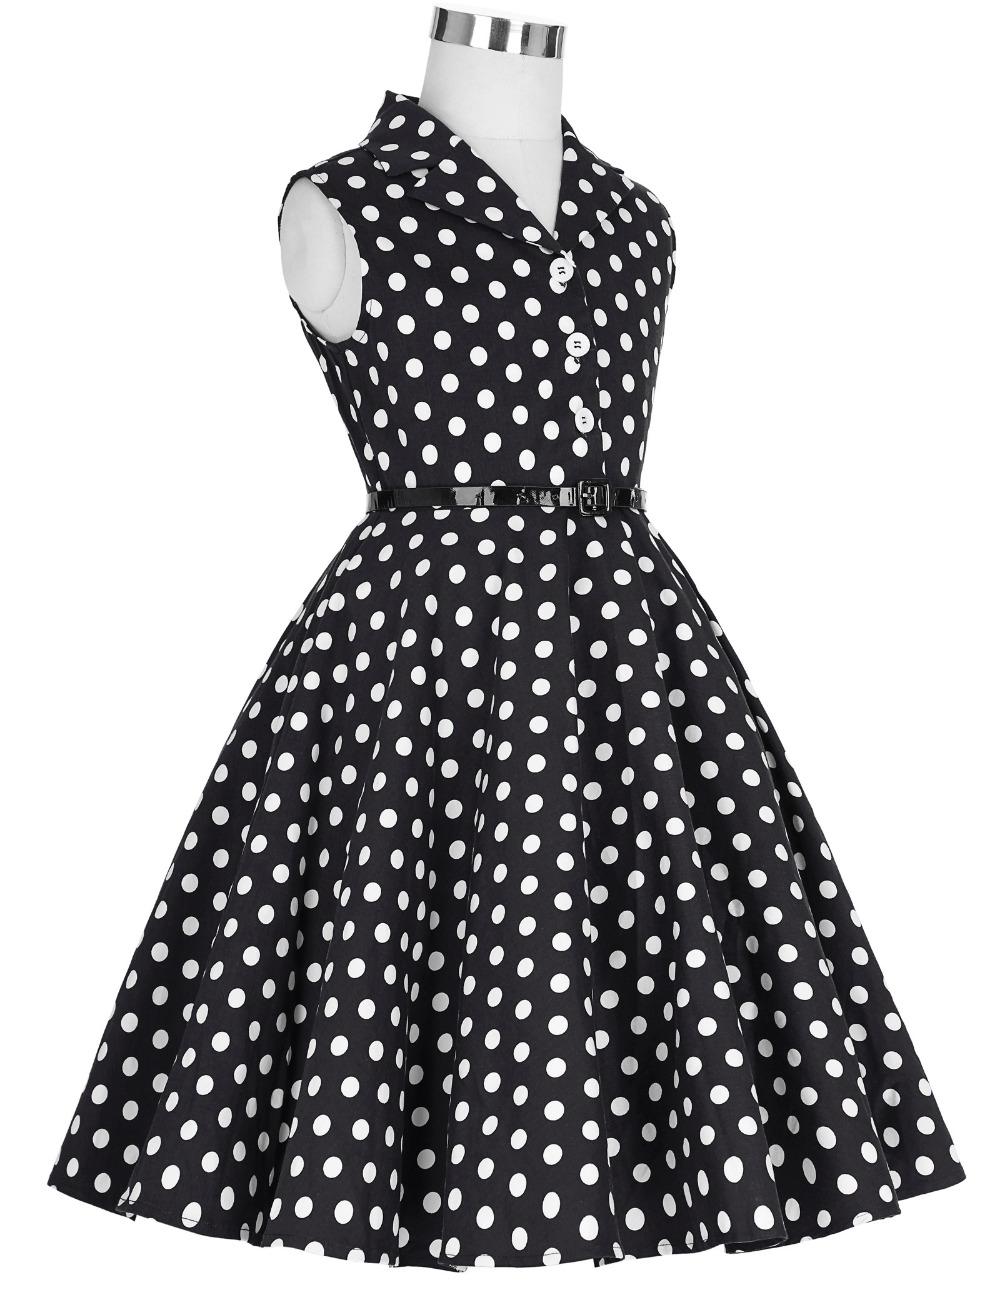 Grace Karin Flower Girl Dresses for Weddings 2017 Sleeveless Polka Dots Printed Vintage Pin Up Style Children's Clothing 6